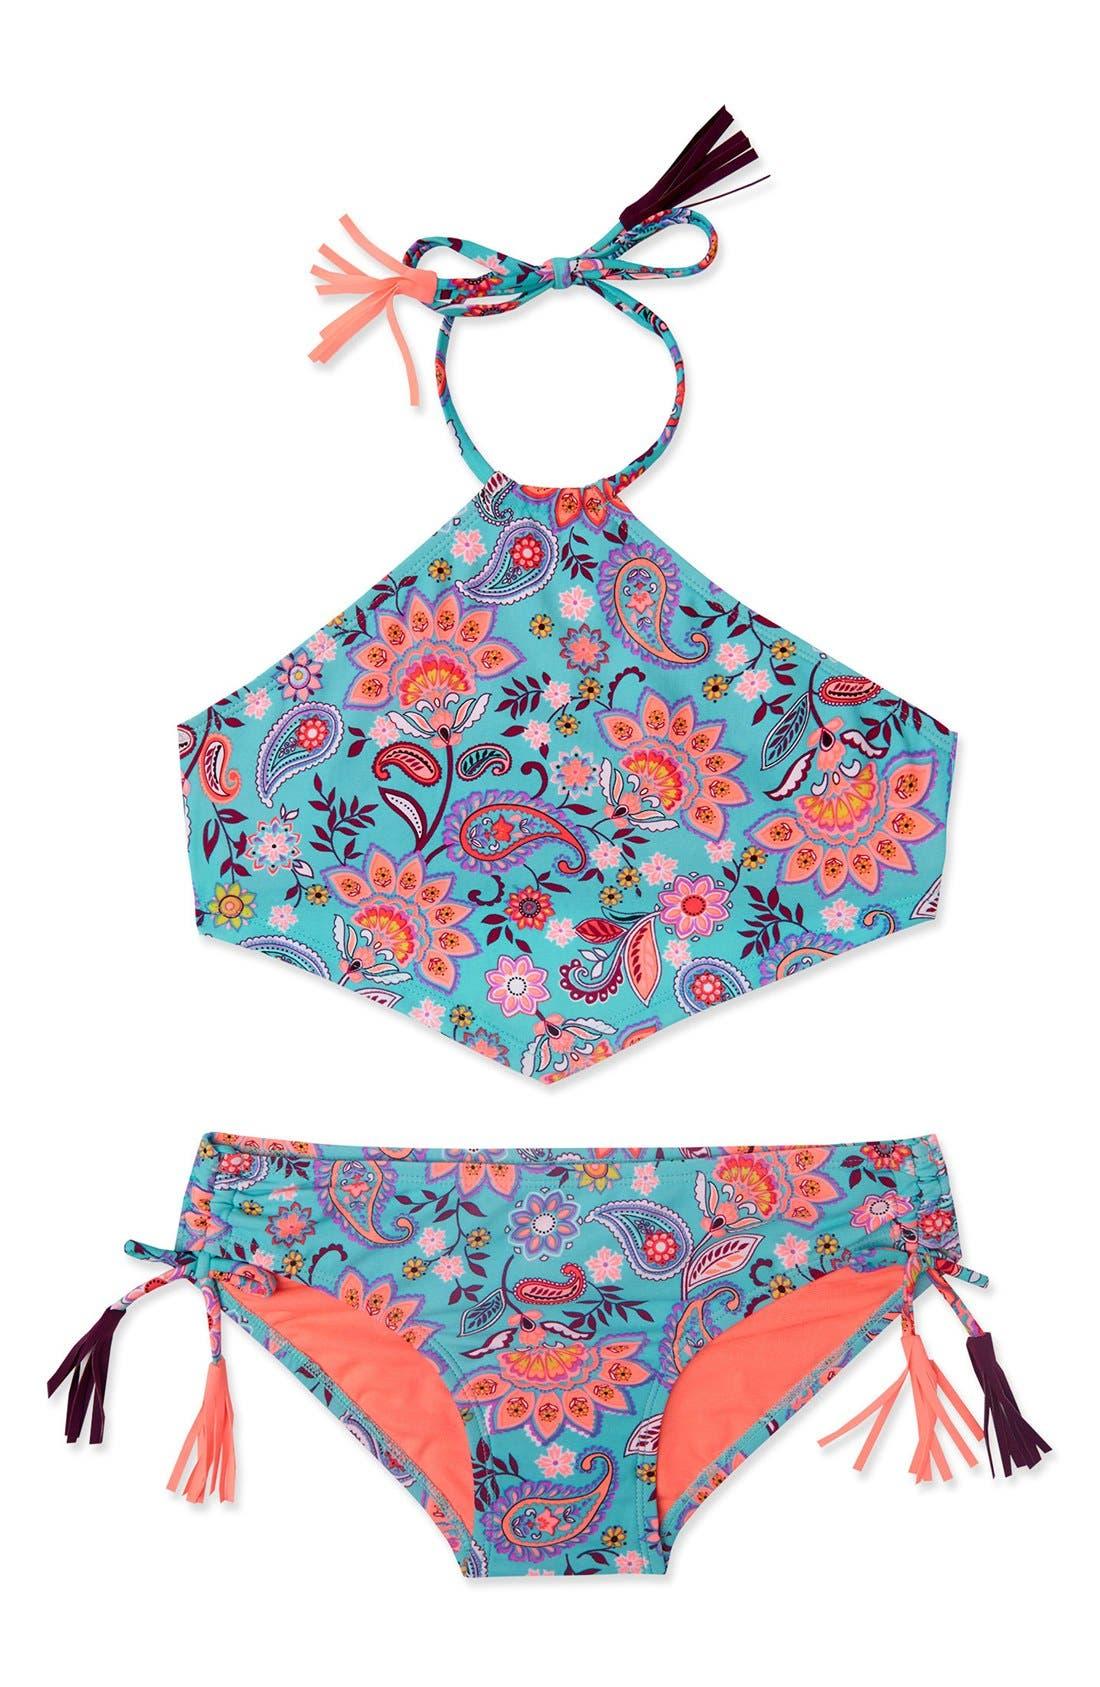 Gossip Girl 'Le Corsaire' Print Two-Piece Swimsuit (Big Girls)